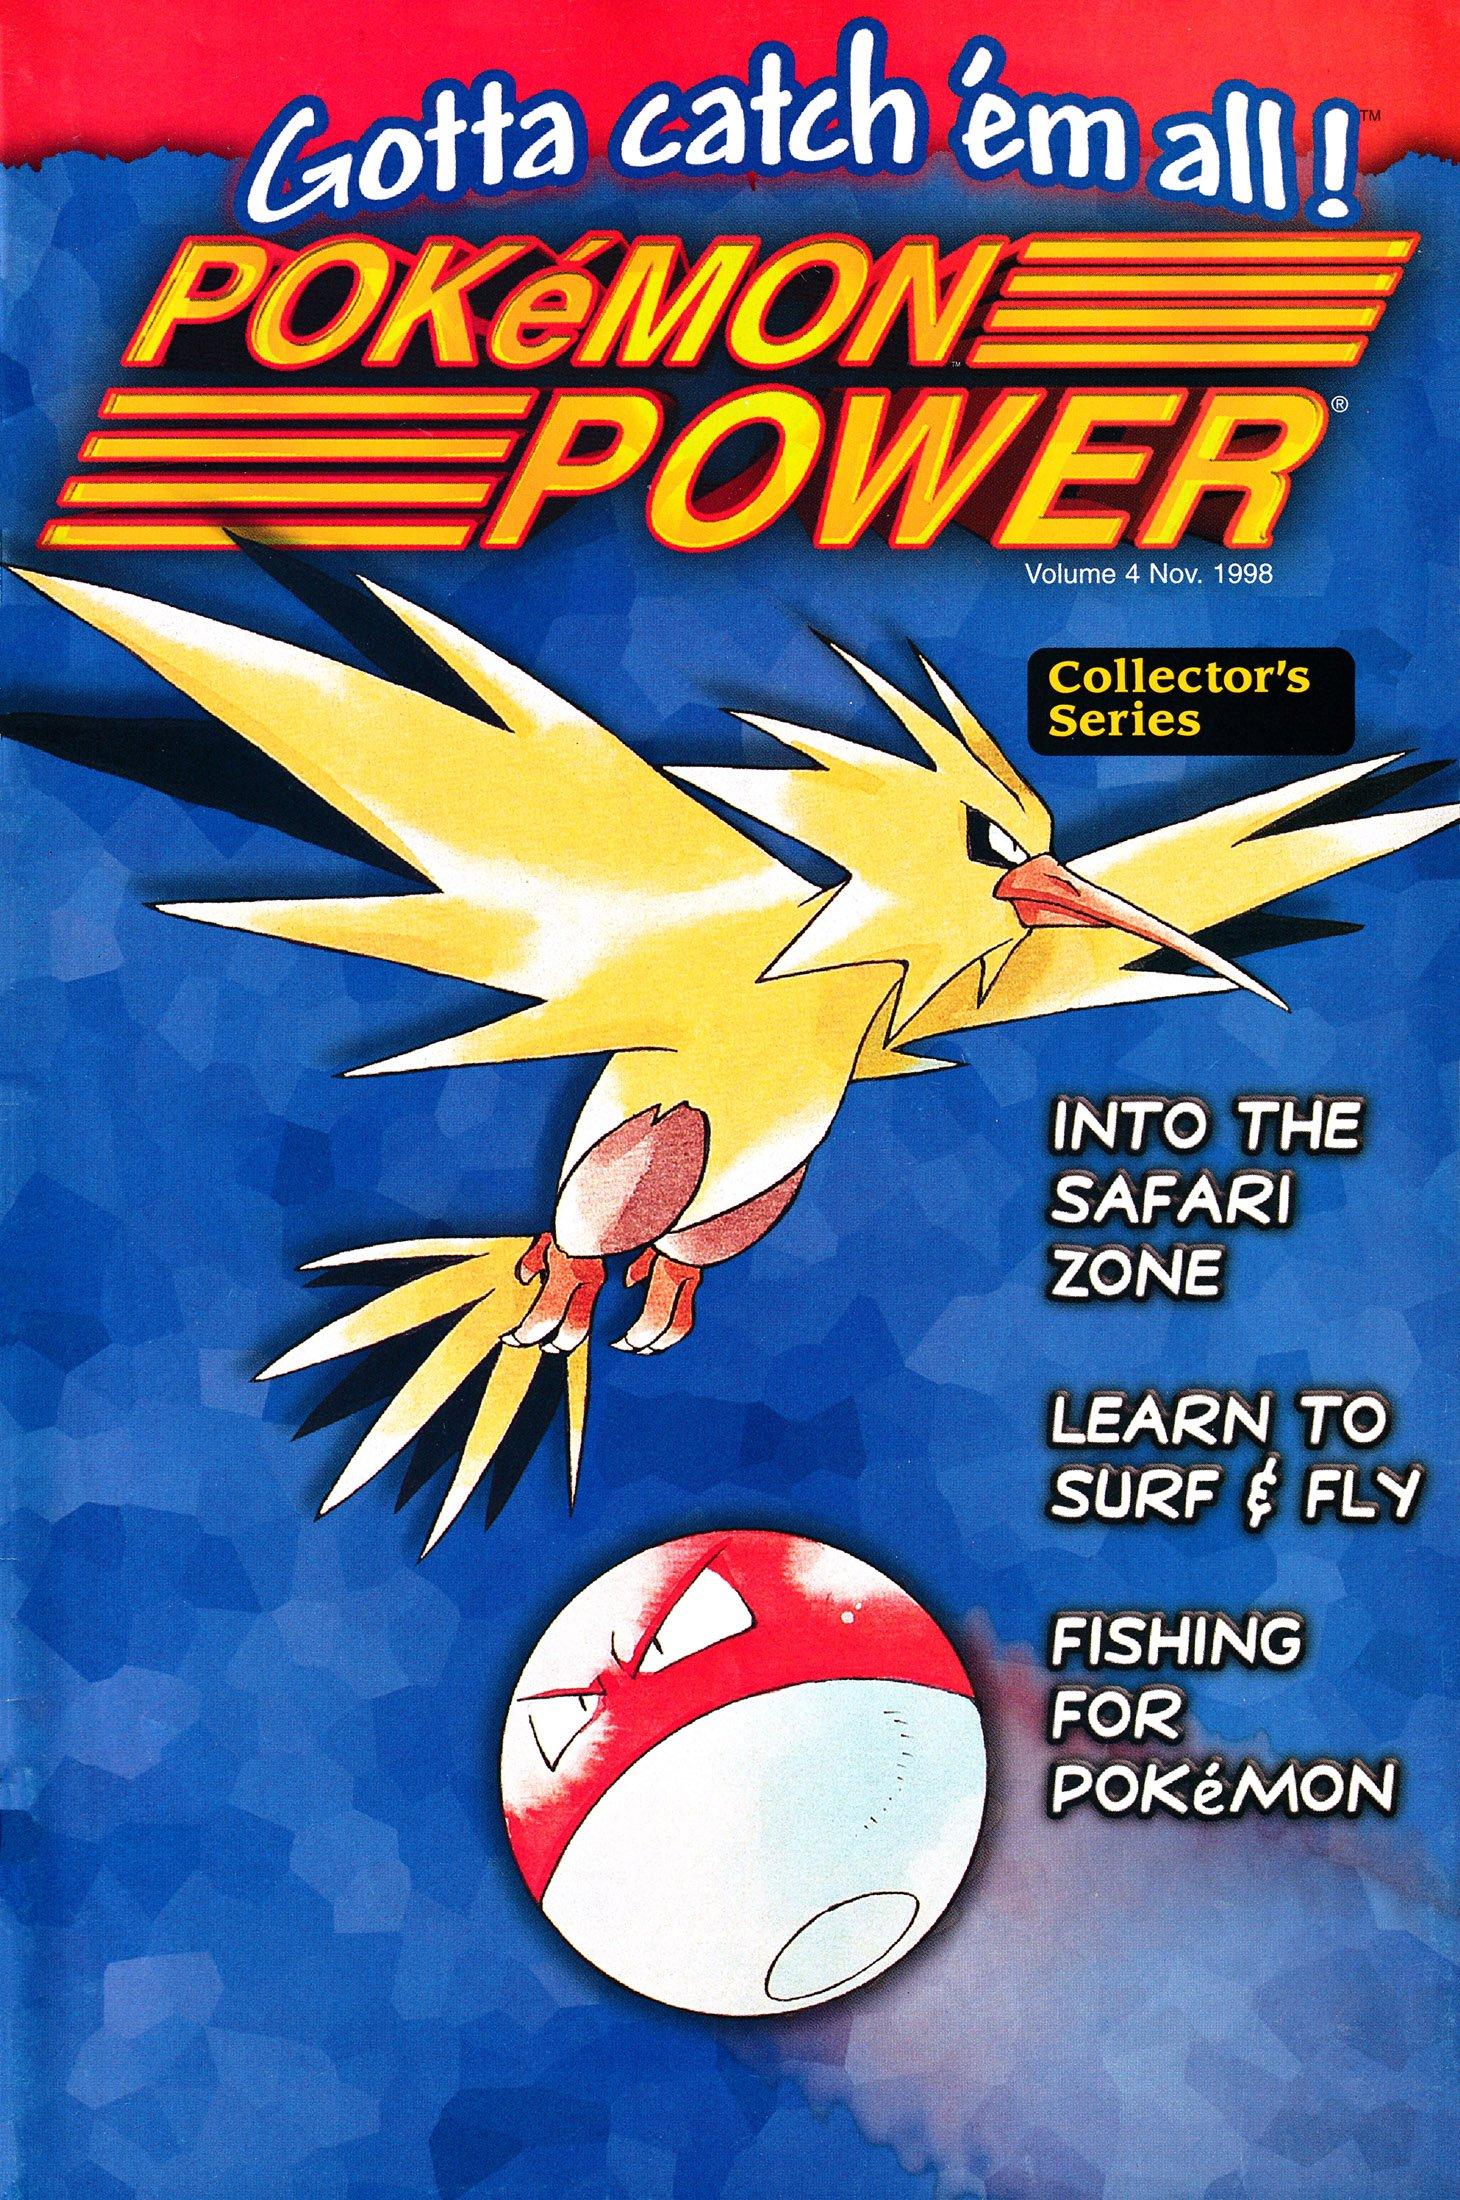 Pokémon Power Volume 4 (November 1998)